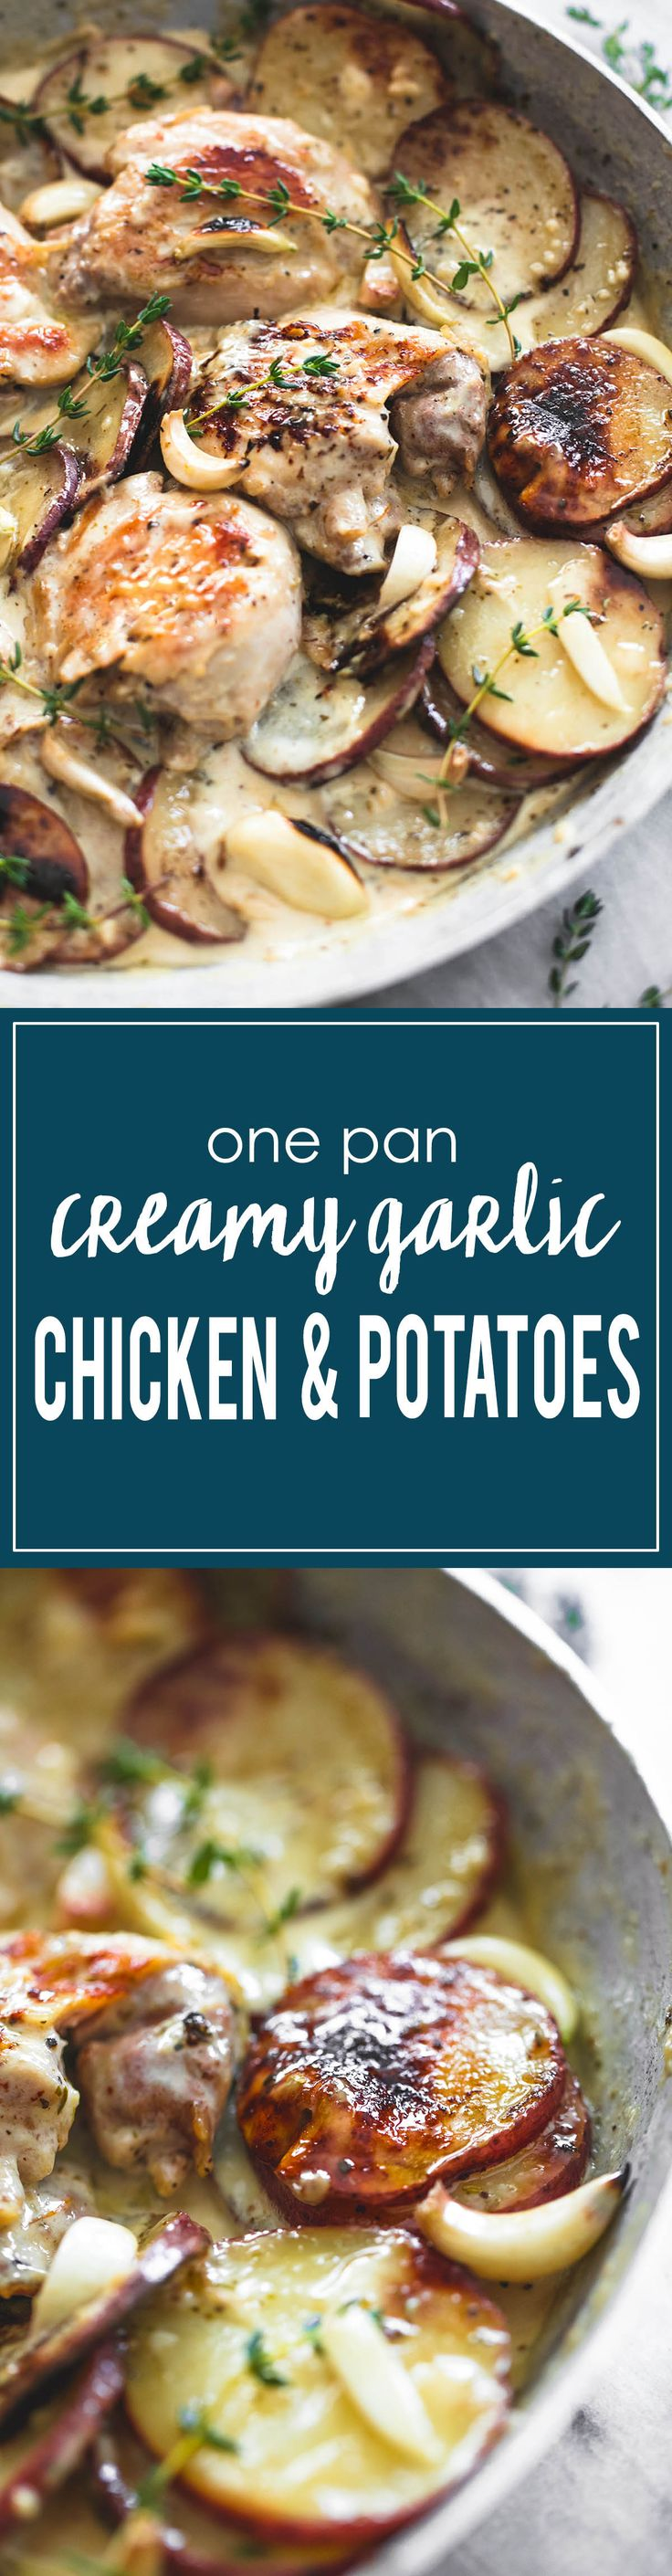 One Pan Creamy Garlic Herb Chicken & Potatoes